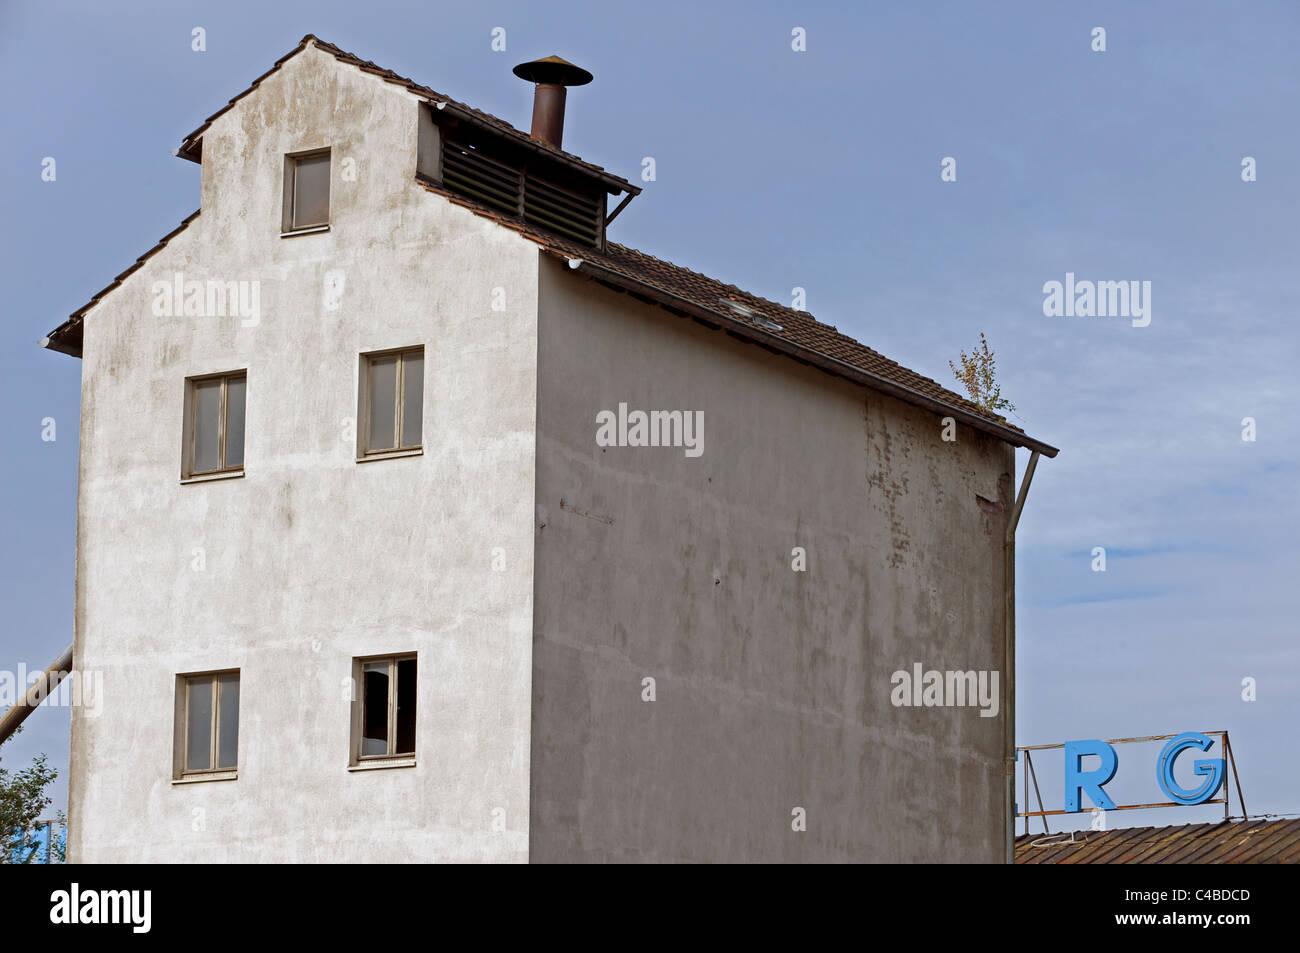 Disused grain mill, Leichlingen, Germany. - Stock Image